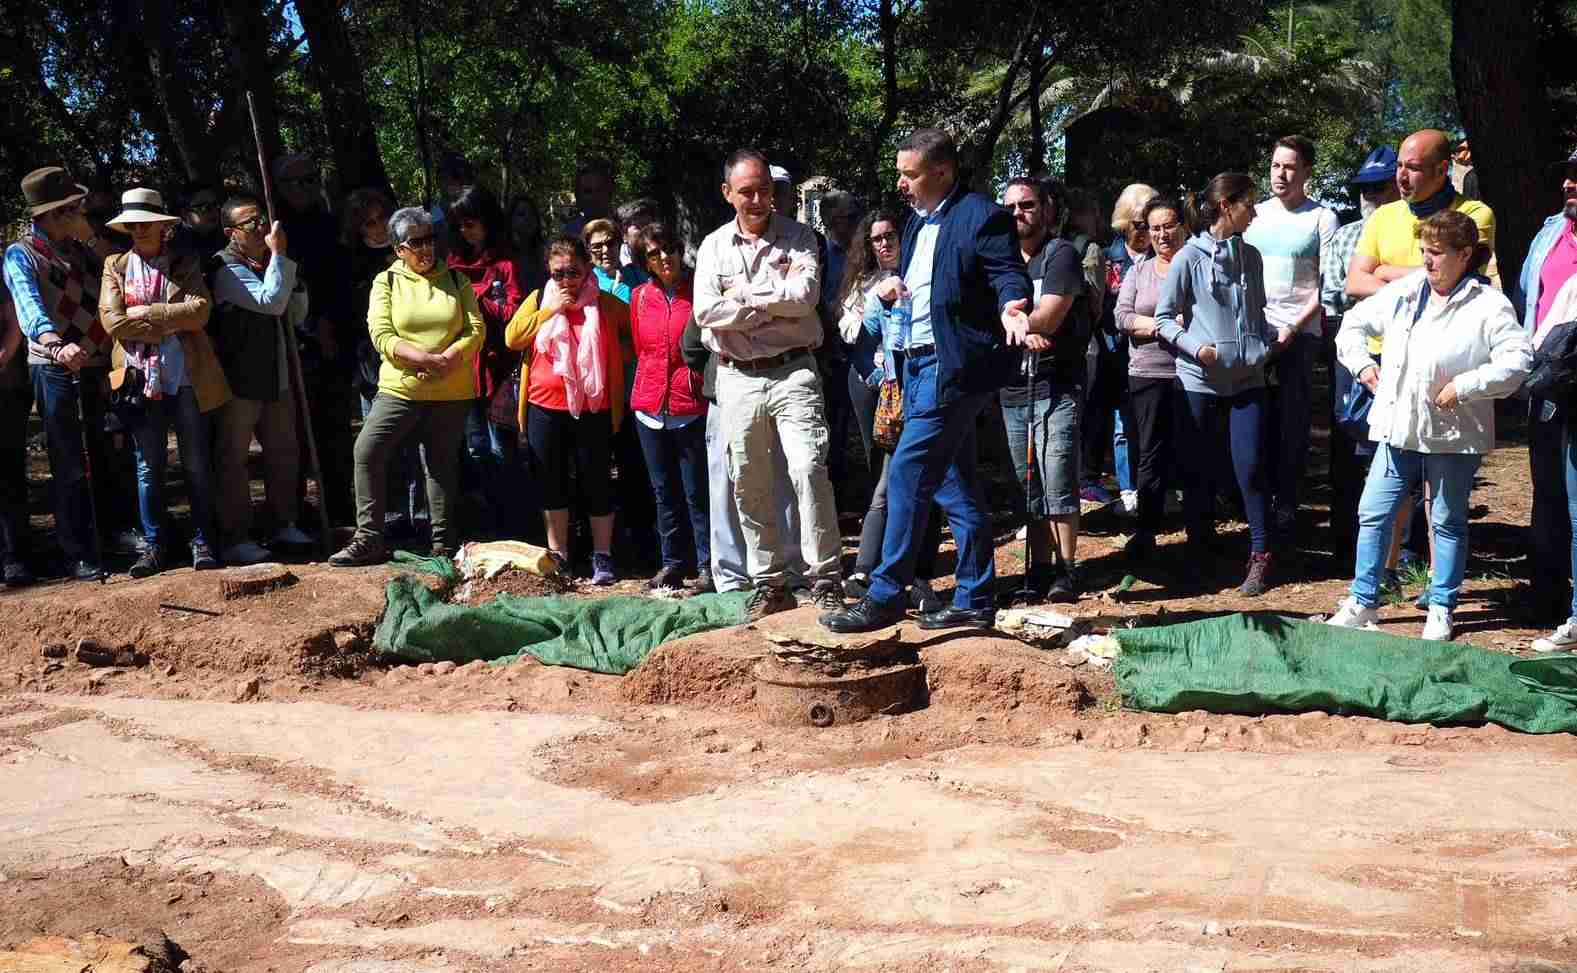 Gran éxito de la jornada arqueológica de Terrinches 11